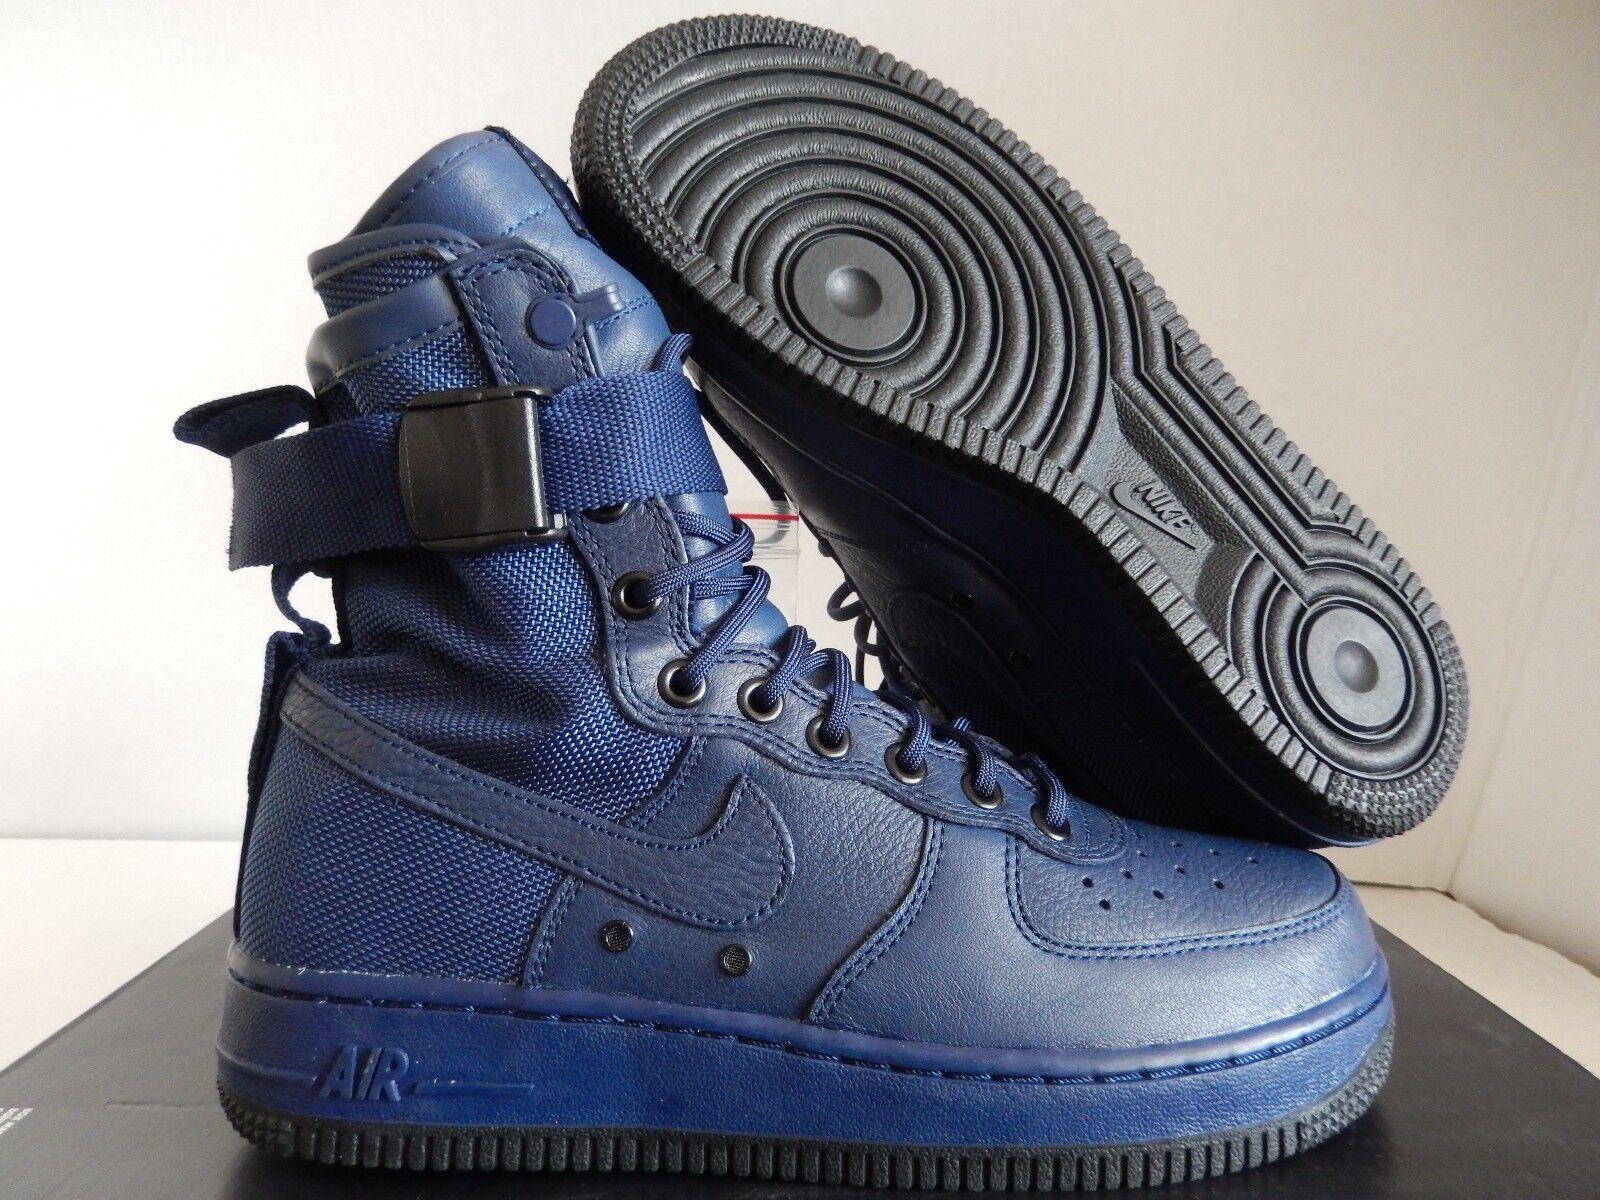 WMNS AIR FORCE 1 SF AF1 SPECIAL FIELD USA BINARY BLUE SZ 7.5 [857872-400]